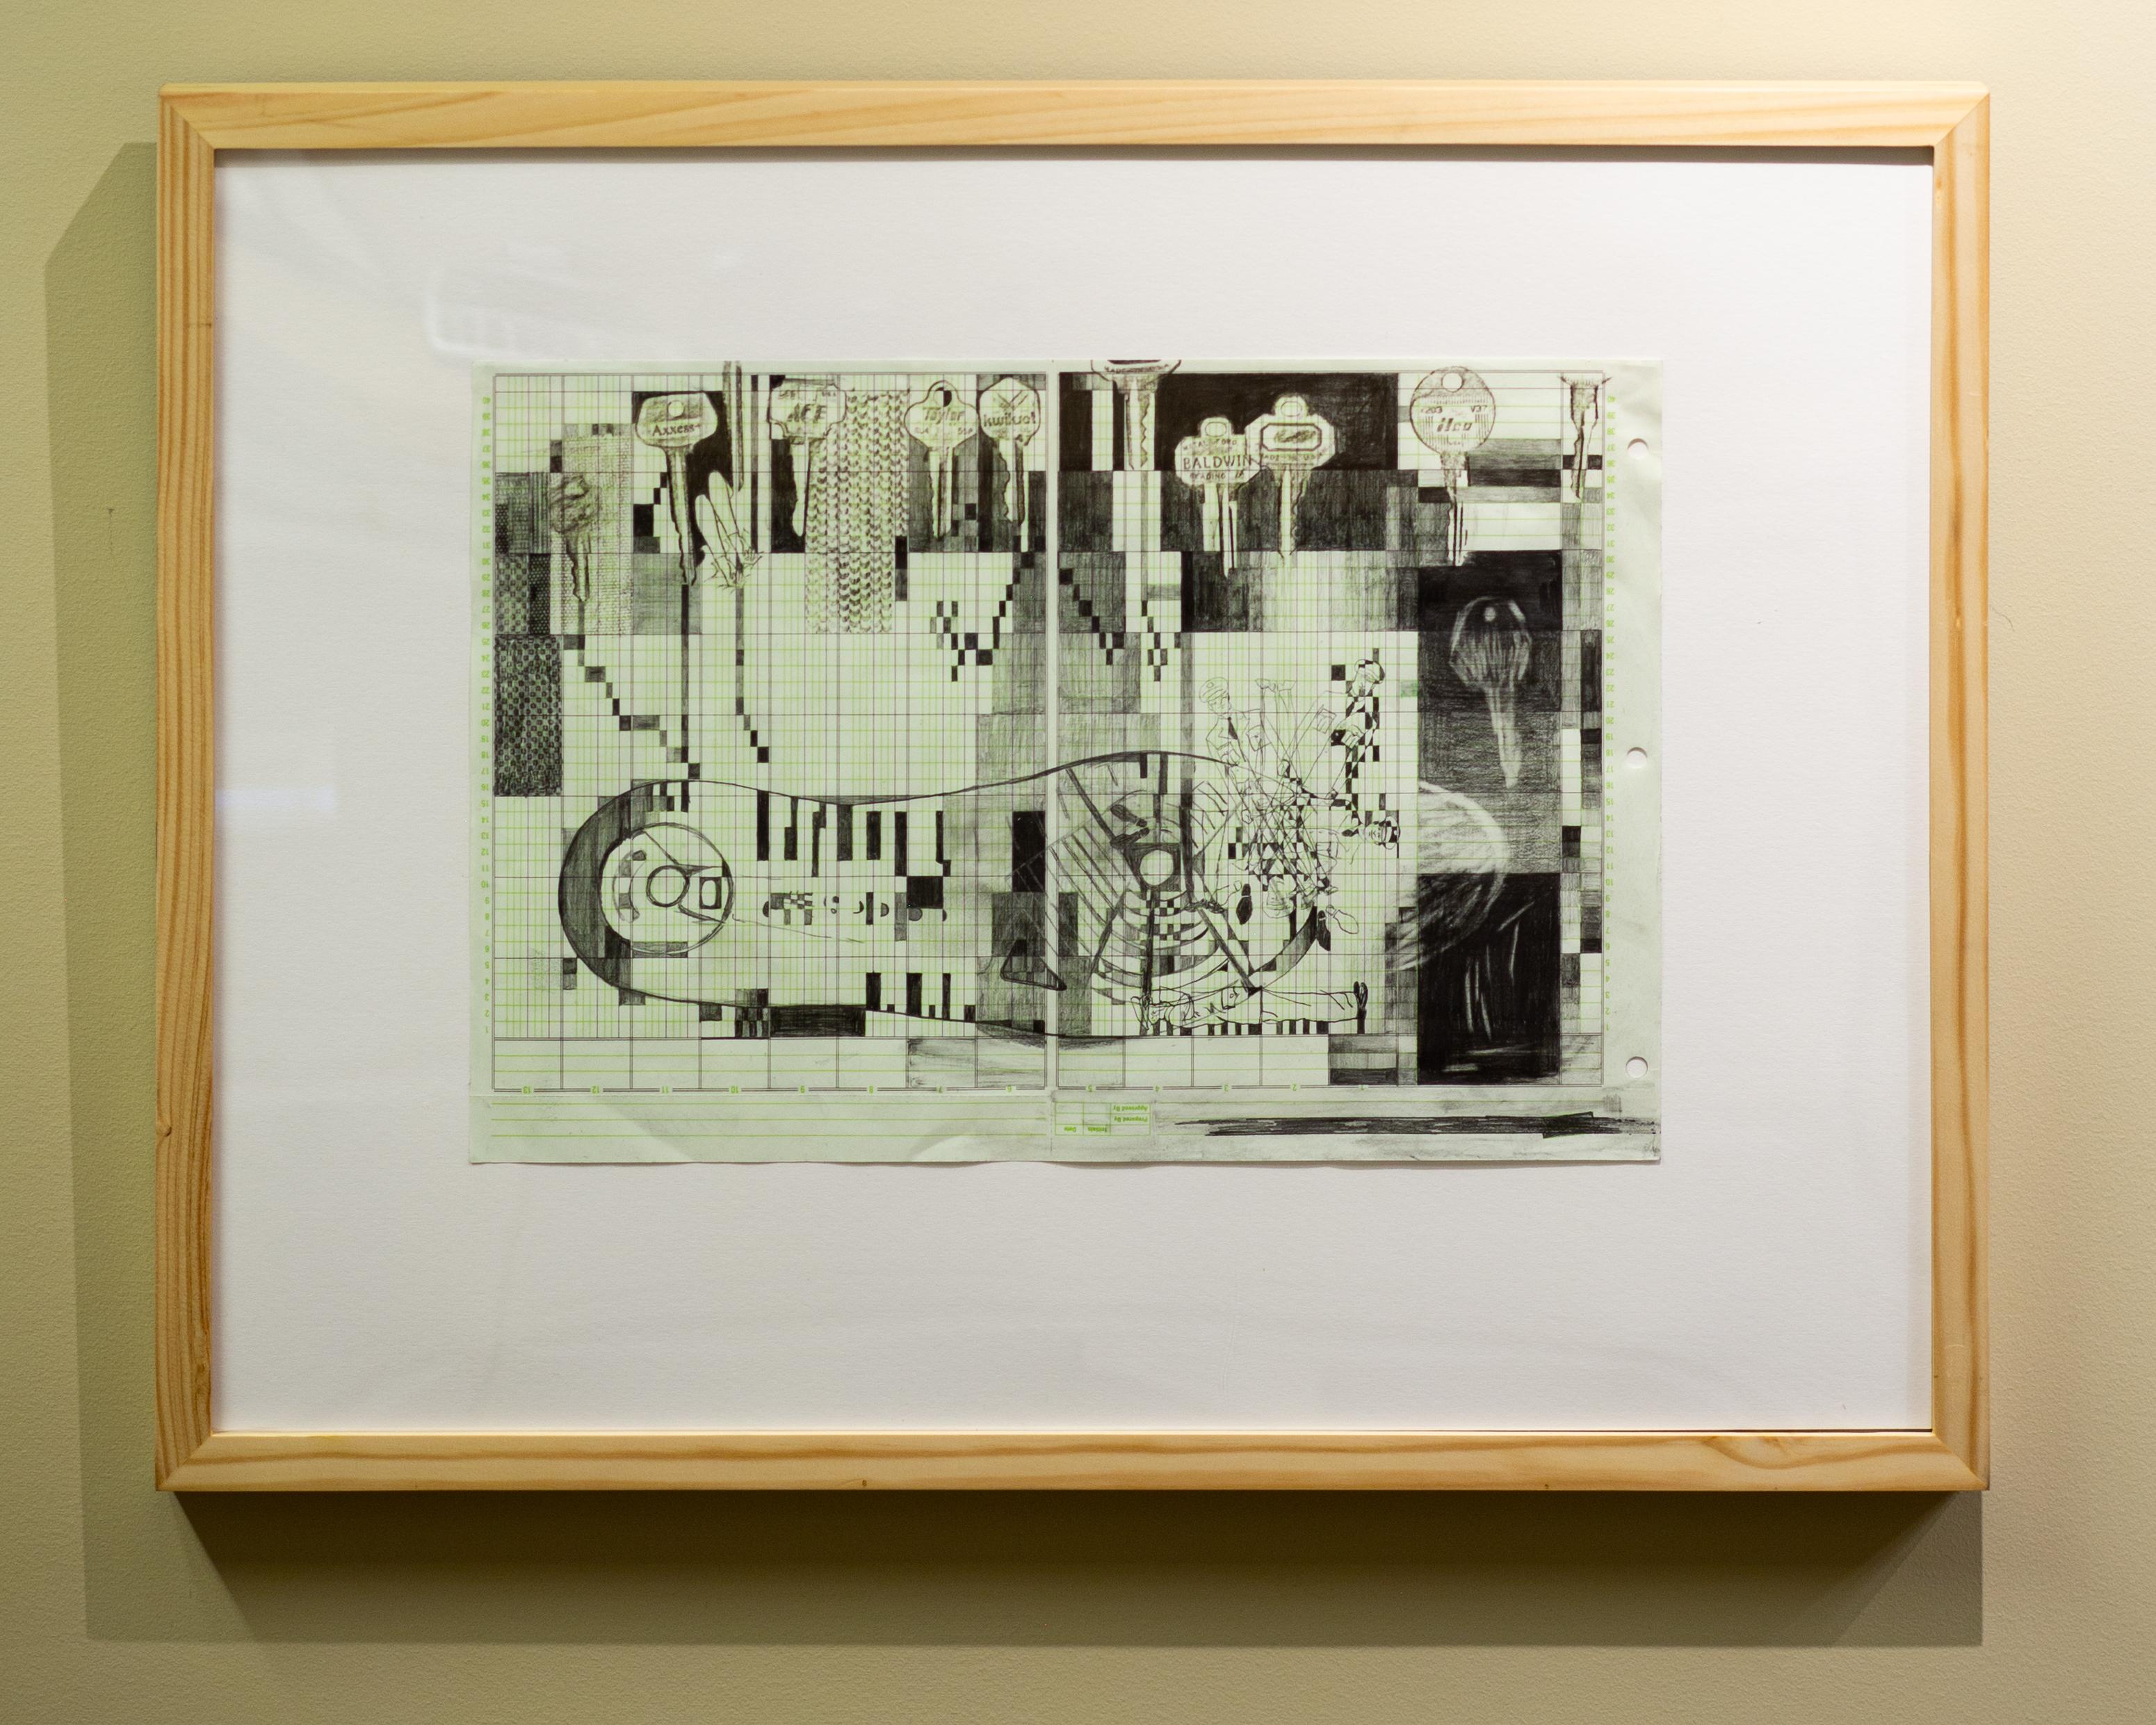 "Lynne Ghenov, Keysole, 11"" x 16 3/8"", graphite on found ledger paper, 2020"